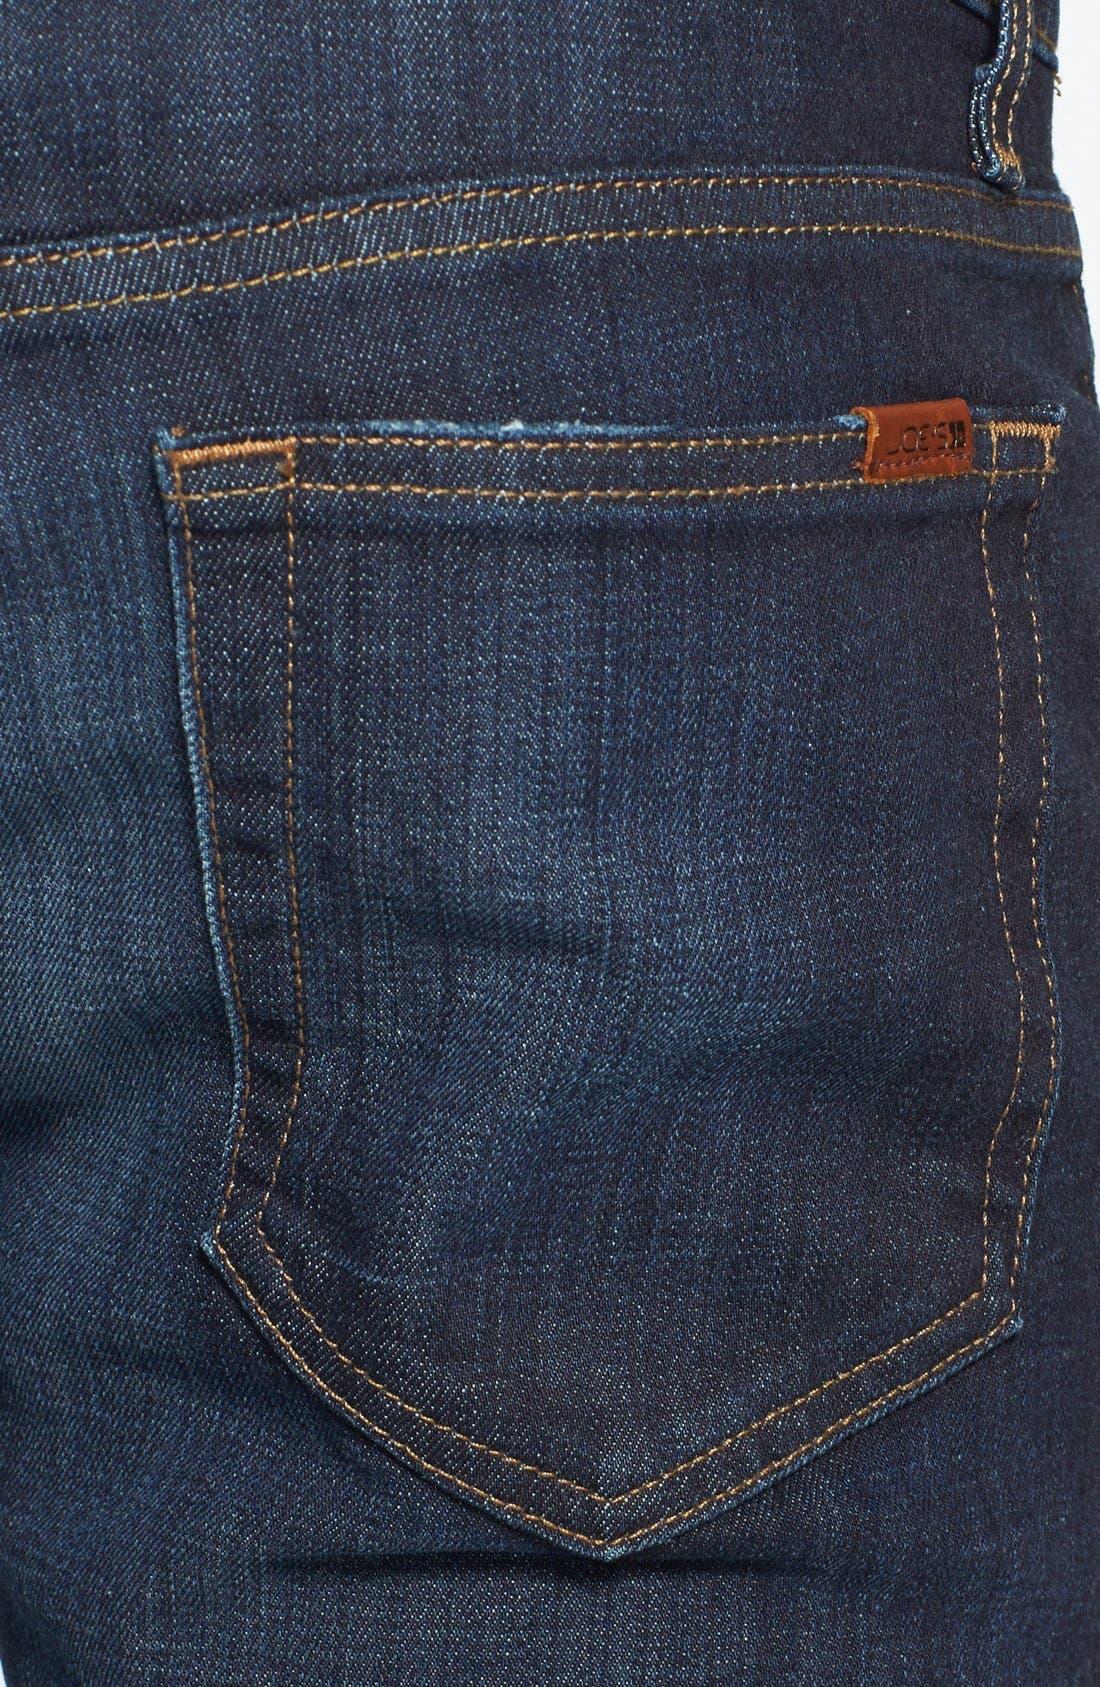 Alternate Image 4  - Joe's 'Slim' Skinny Fit Jeans (Hunter)